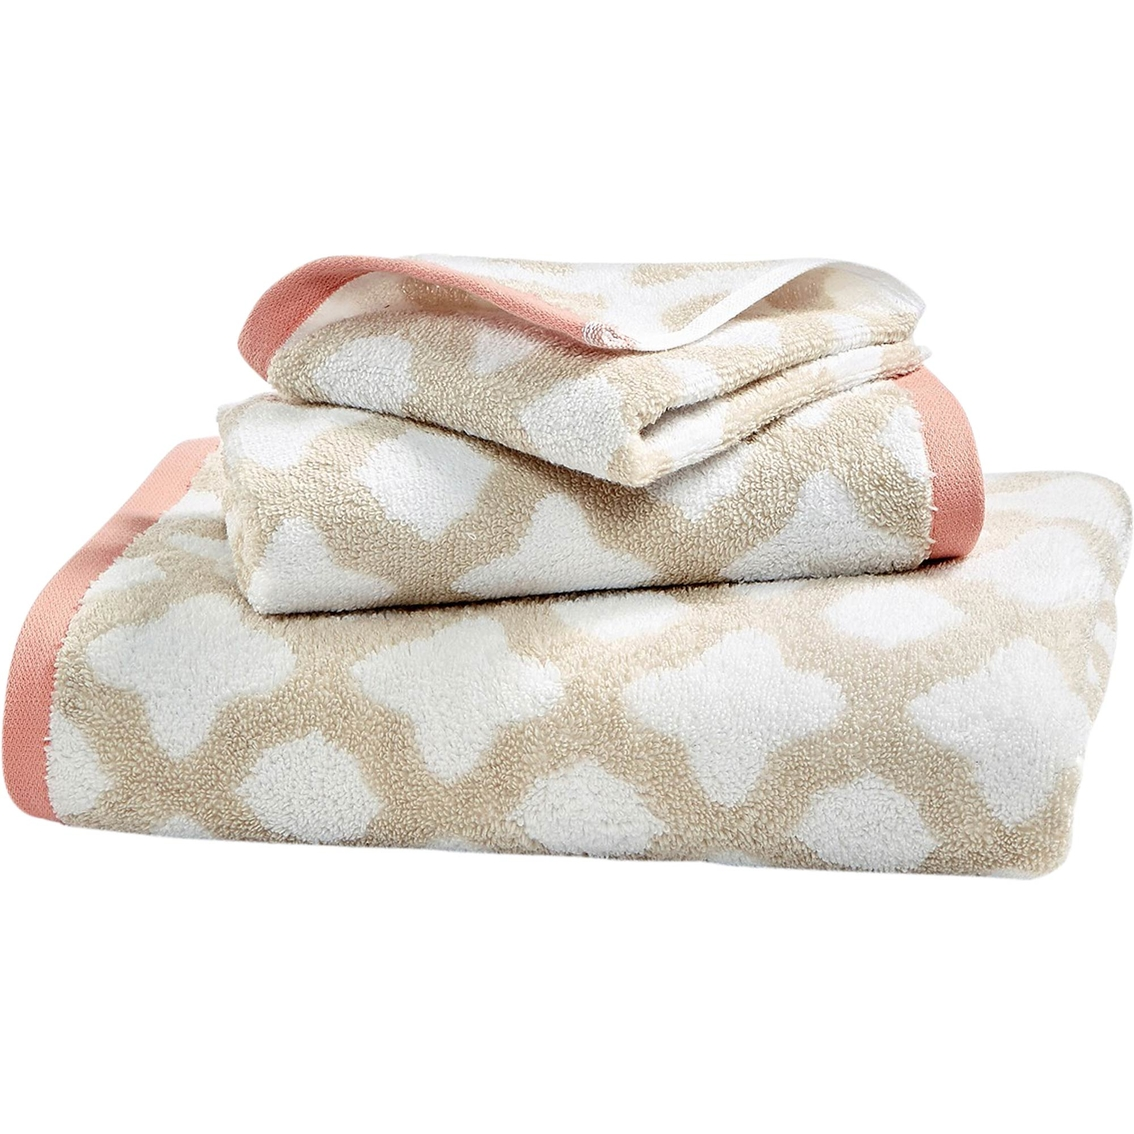 Living Quarters Washcloths: Martha Stewart Collection Cotton Spa Fashion Tile Wash